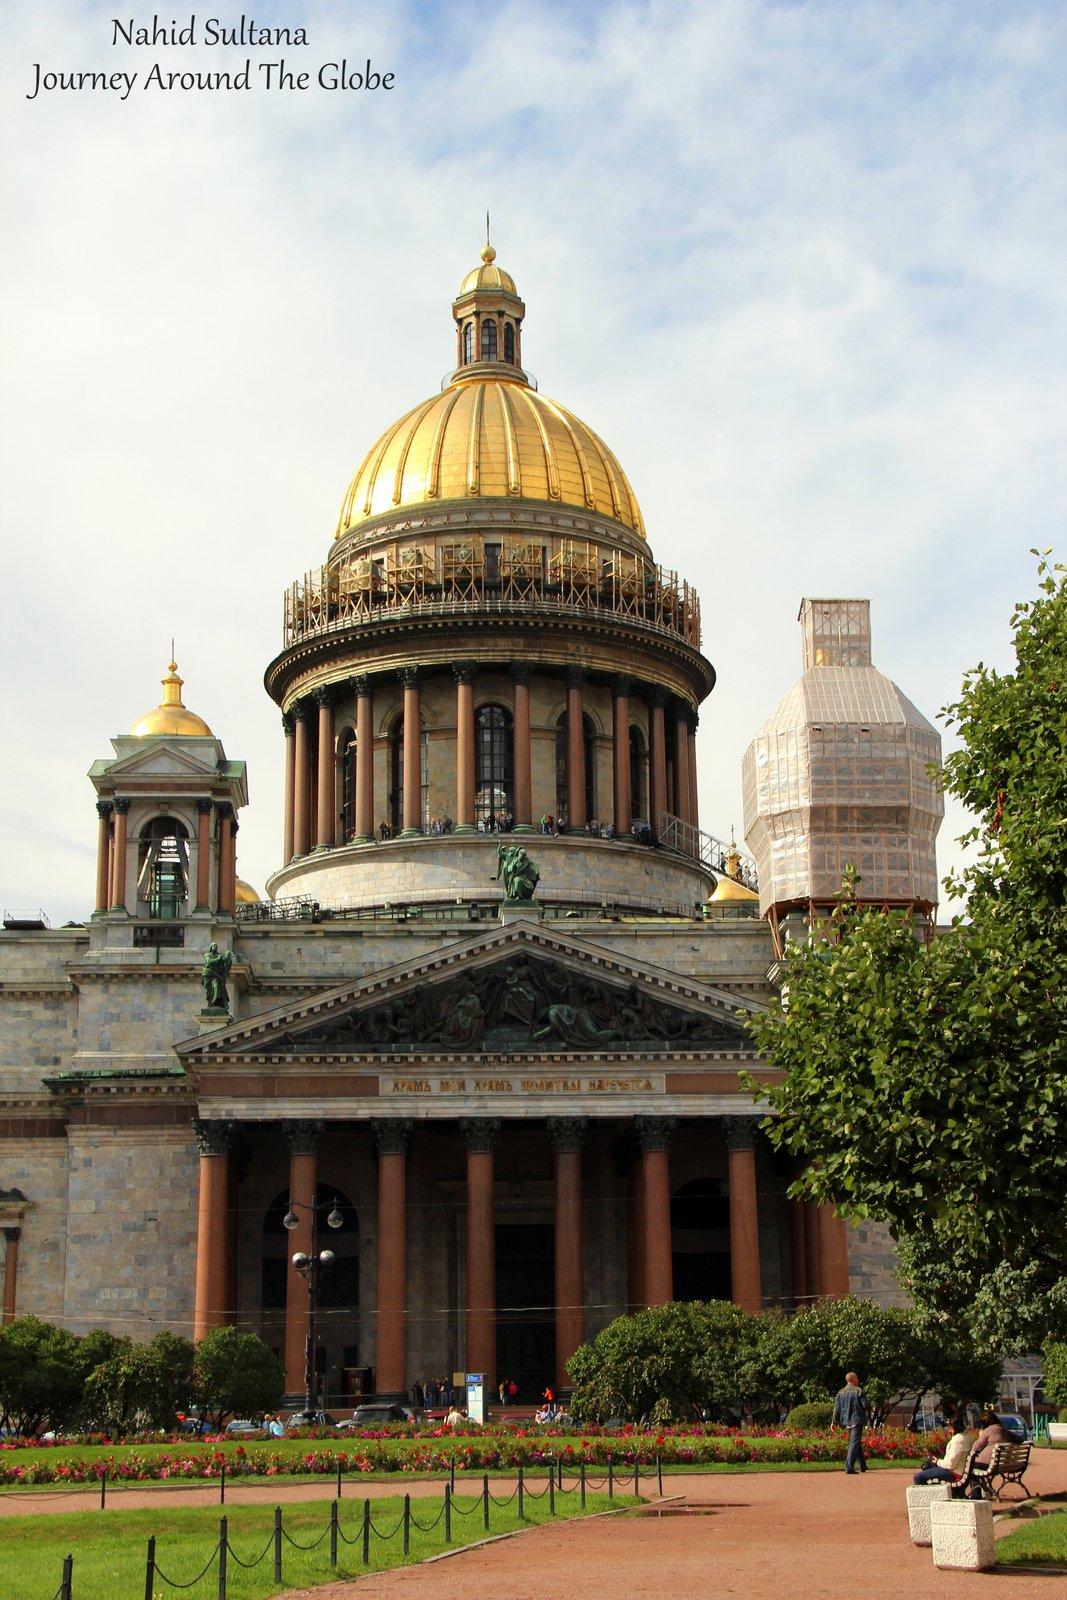 St Petersburg Nood: Journey Around The Globe